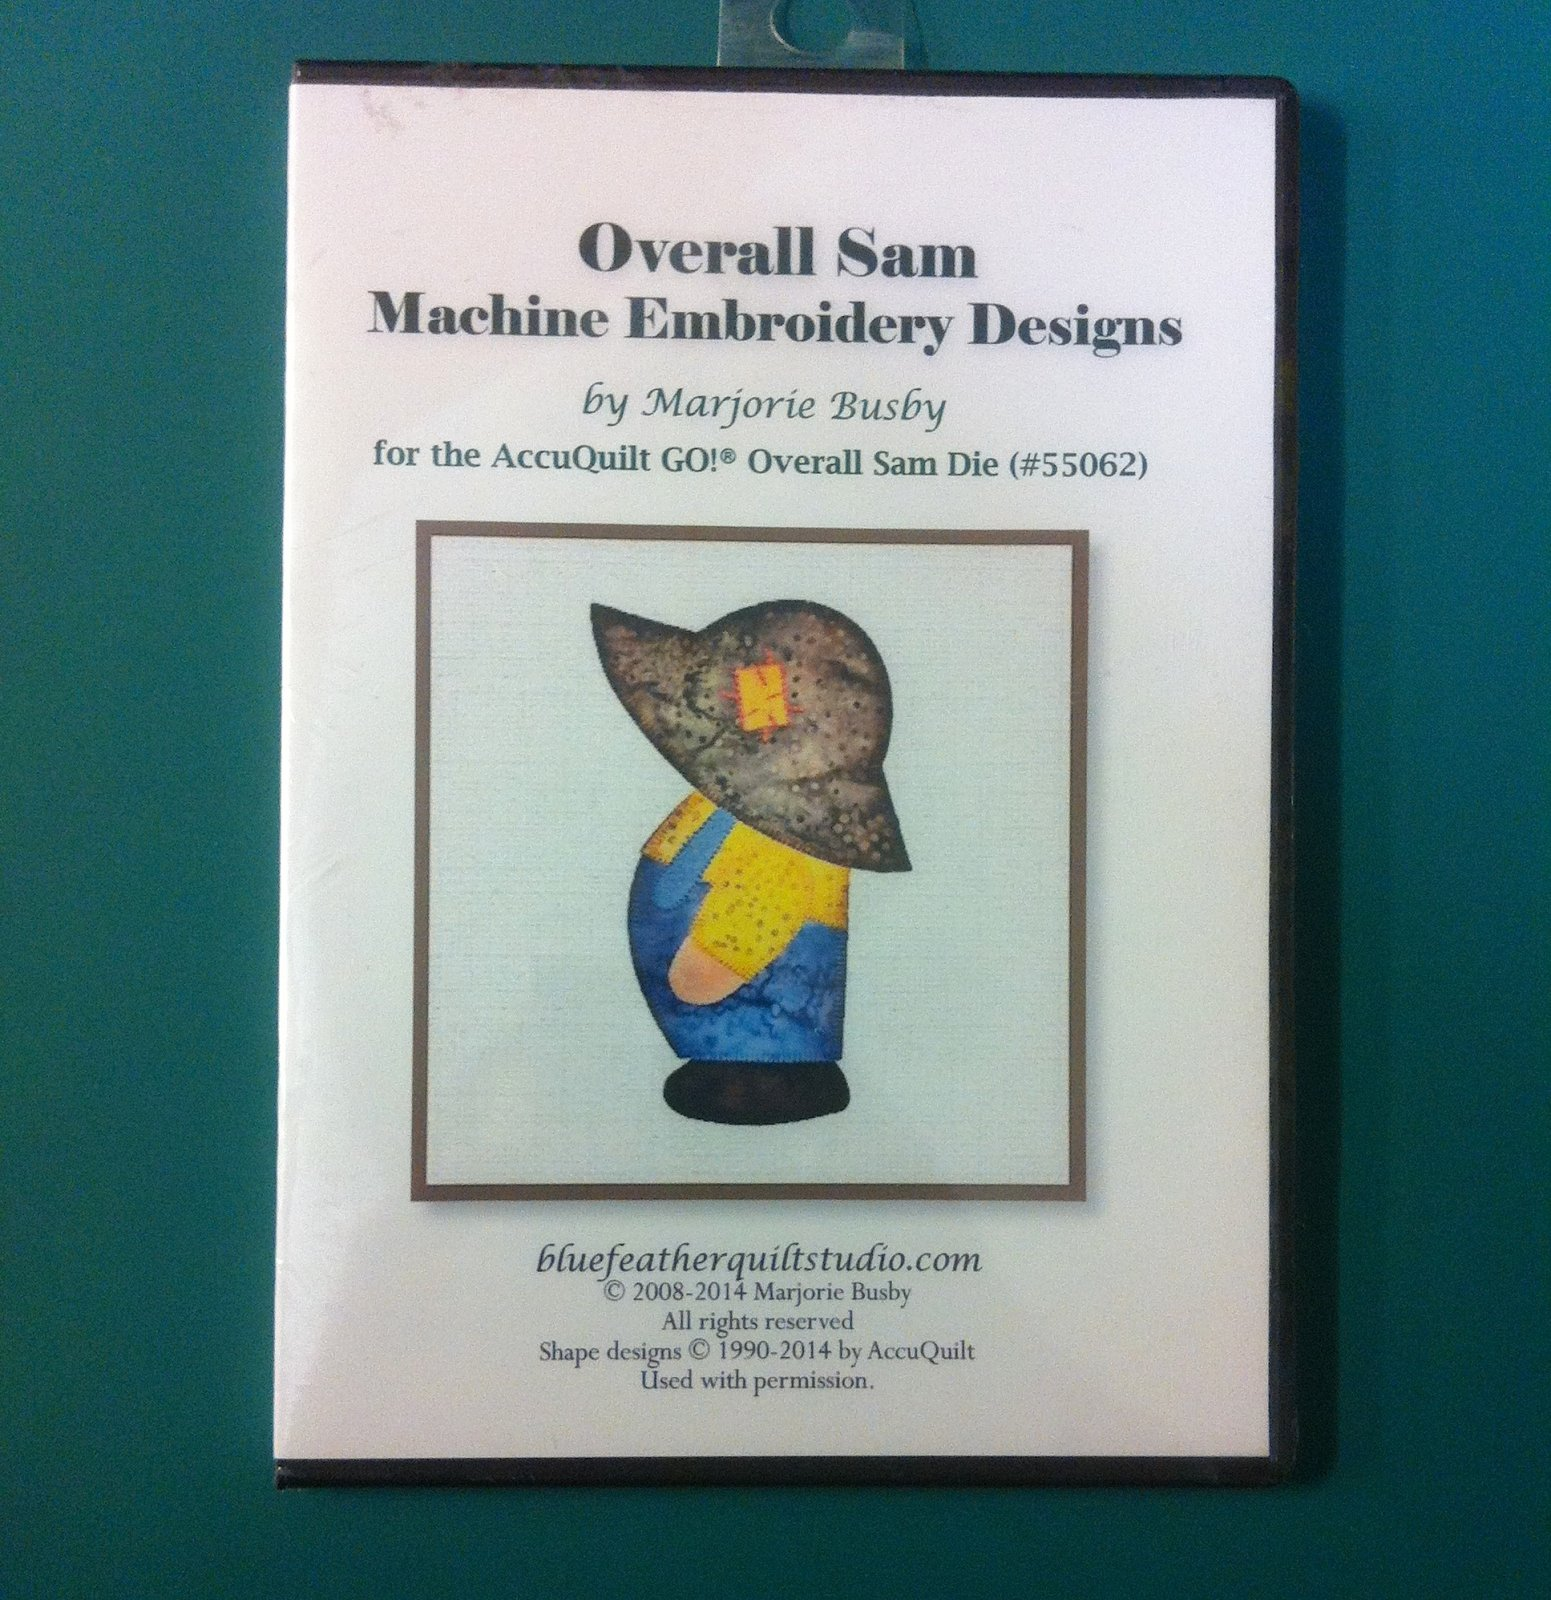 Overall Sam Machine Embroidery Applique